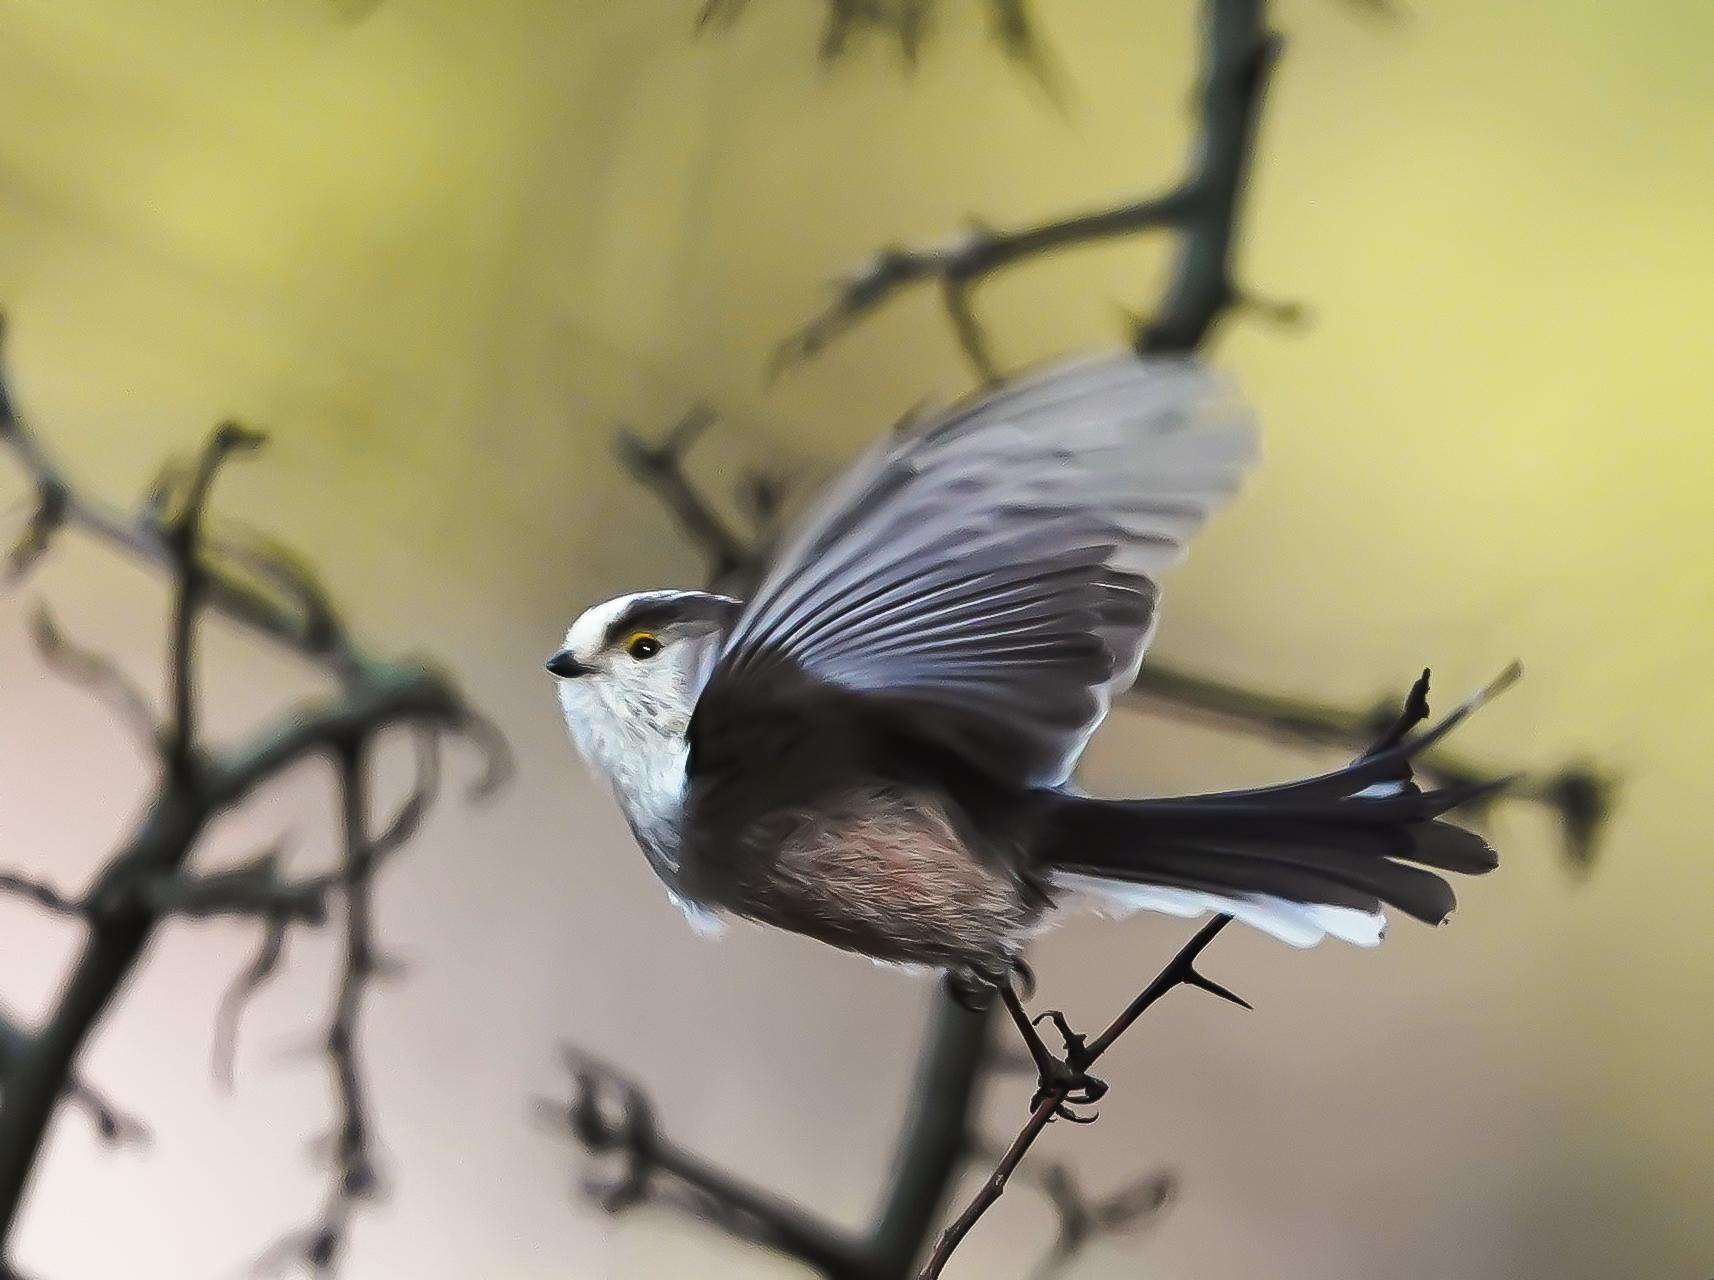 Photo in Wild life | Author Krasimir Georgiev - krassi04 | PHOTO FORUM